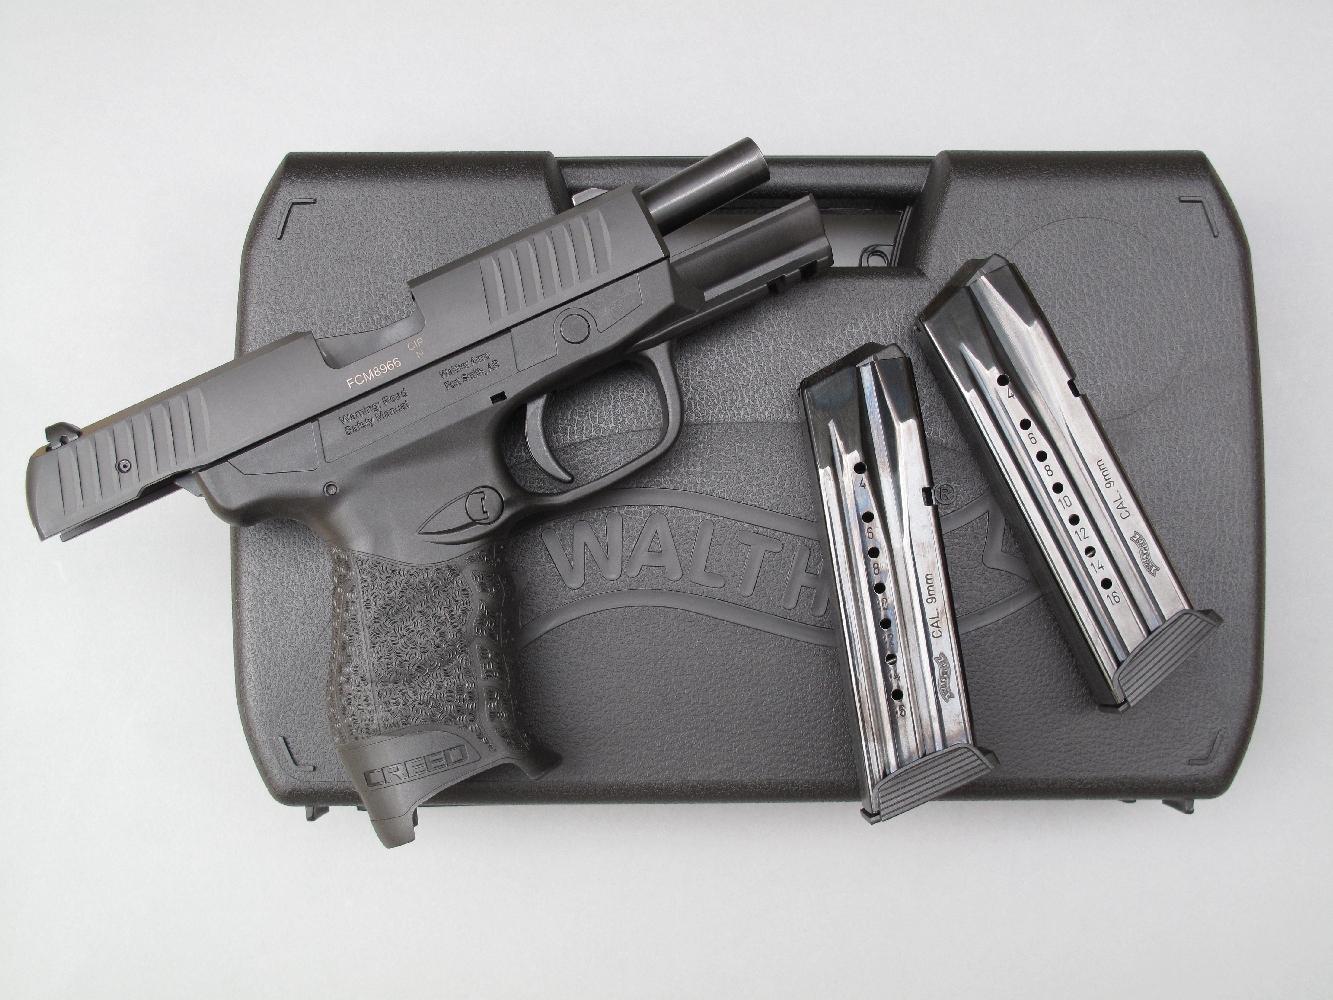 essai armes pistolet walther mod le creed calibre. Black Bedroom Furniture Sets. Home Design Ideas